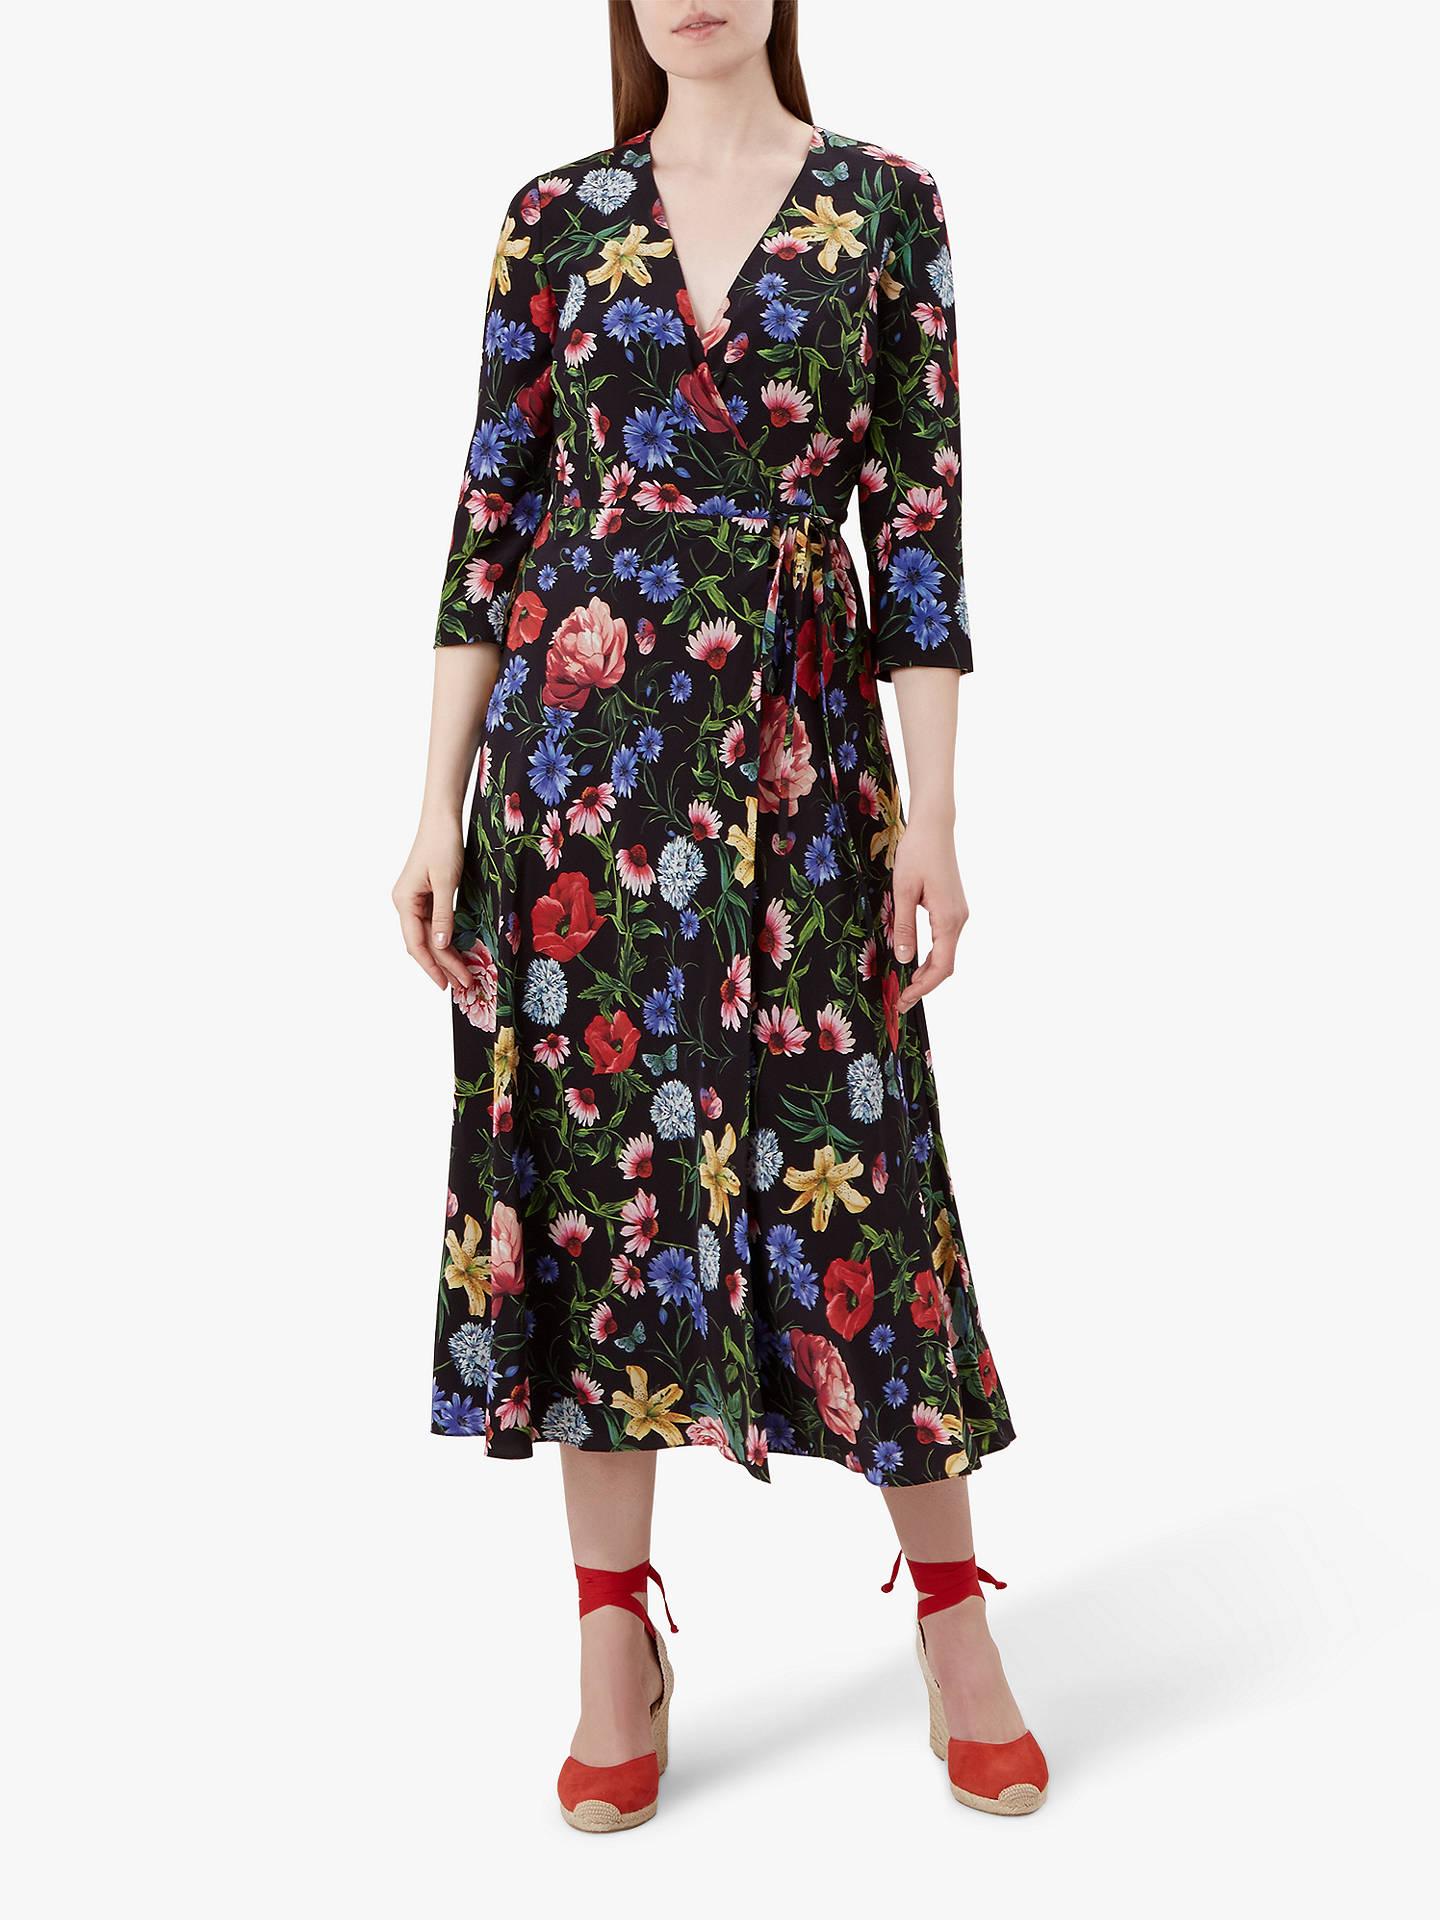 58fa401bf749b Hobbs Chelsea Wrap Floral Silk Dress, Black/Multi